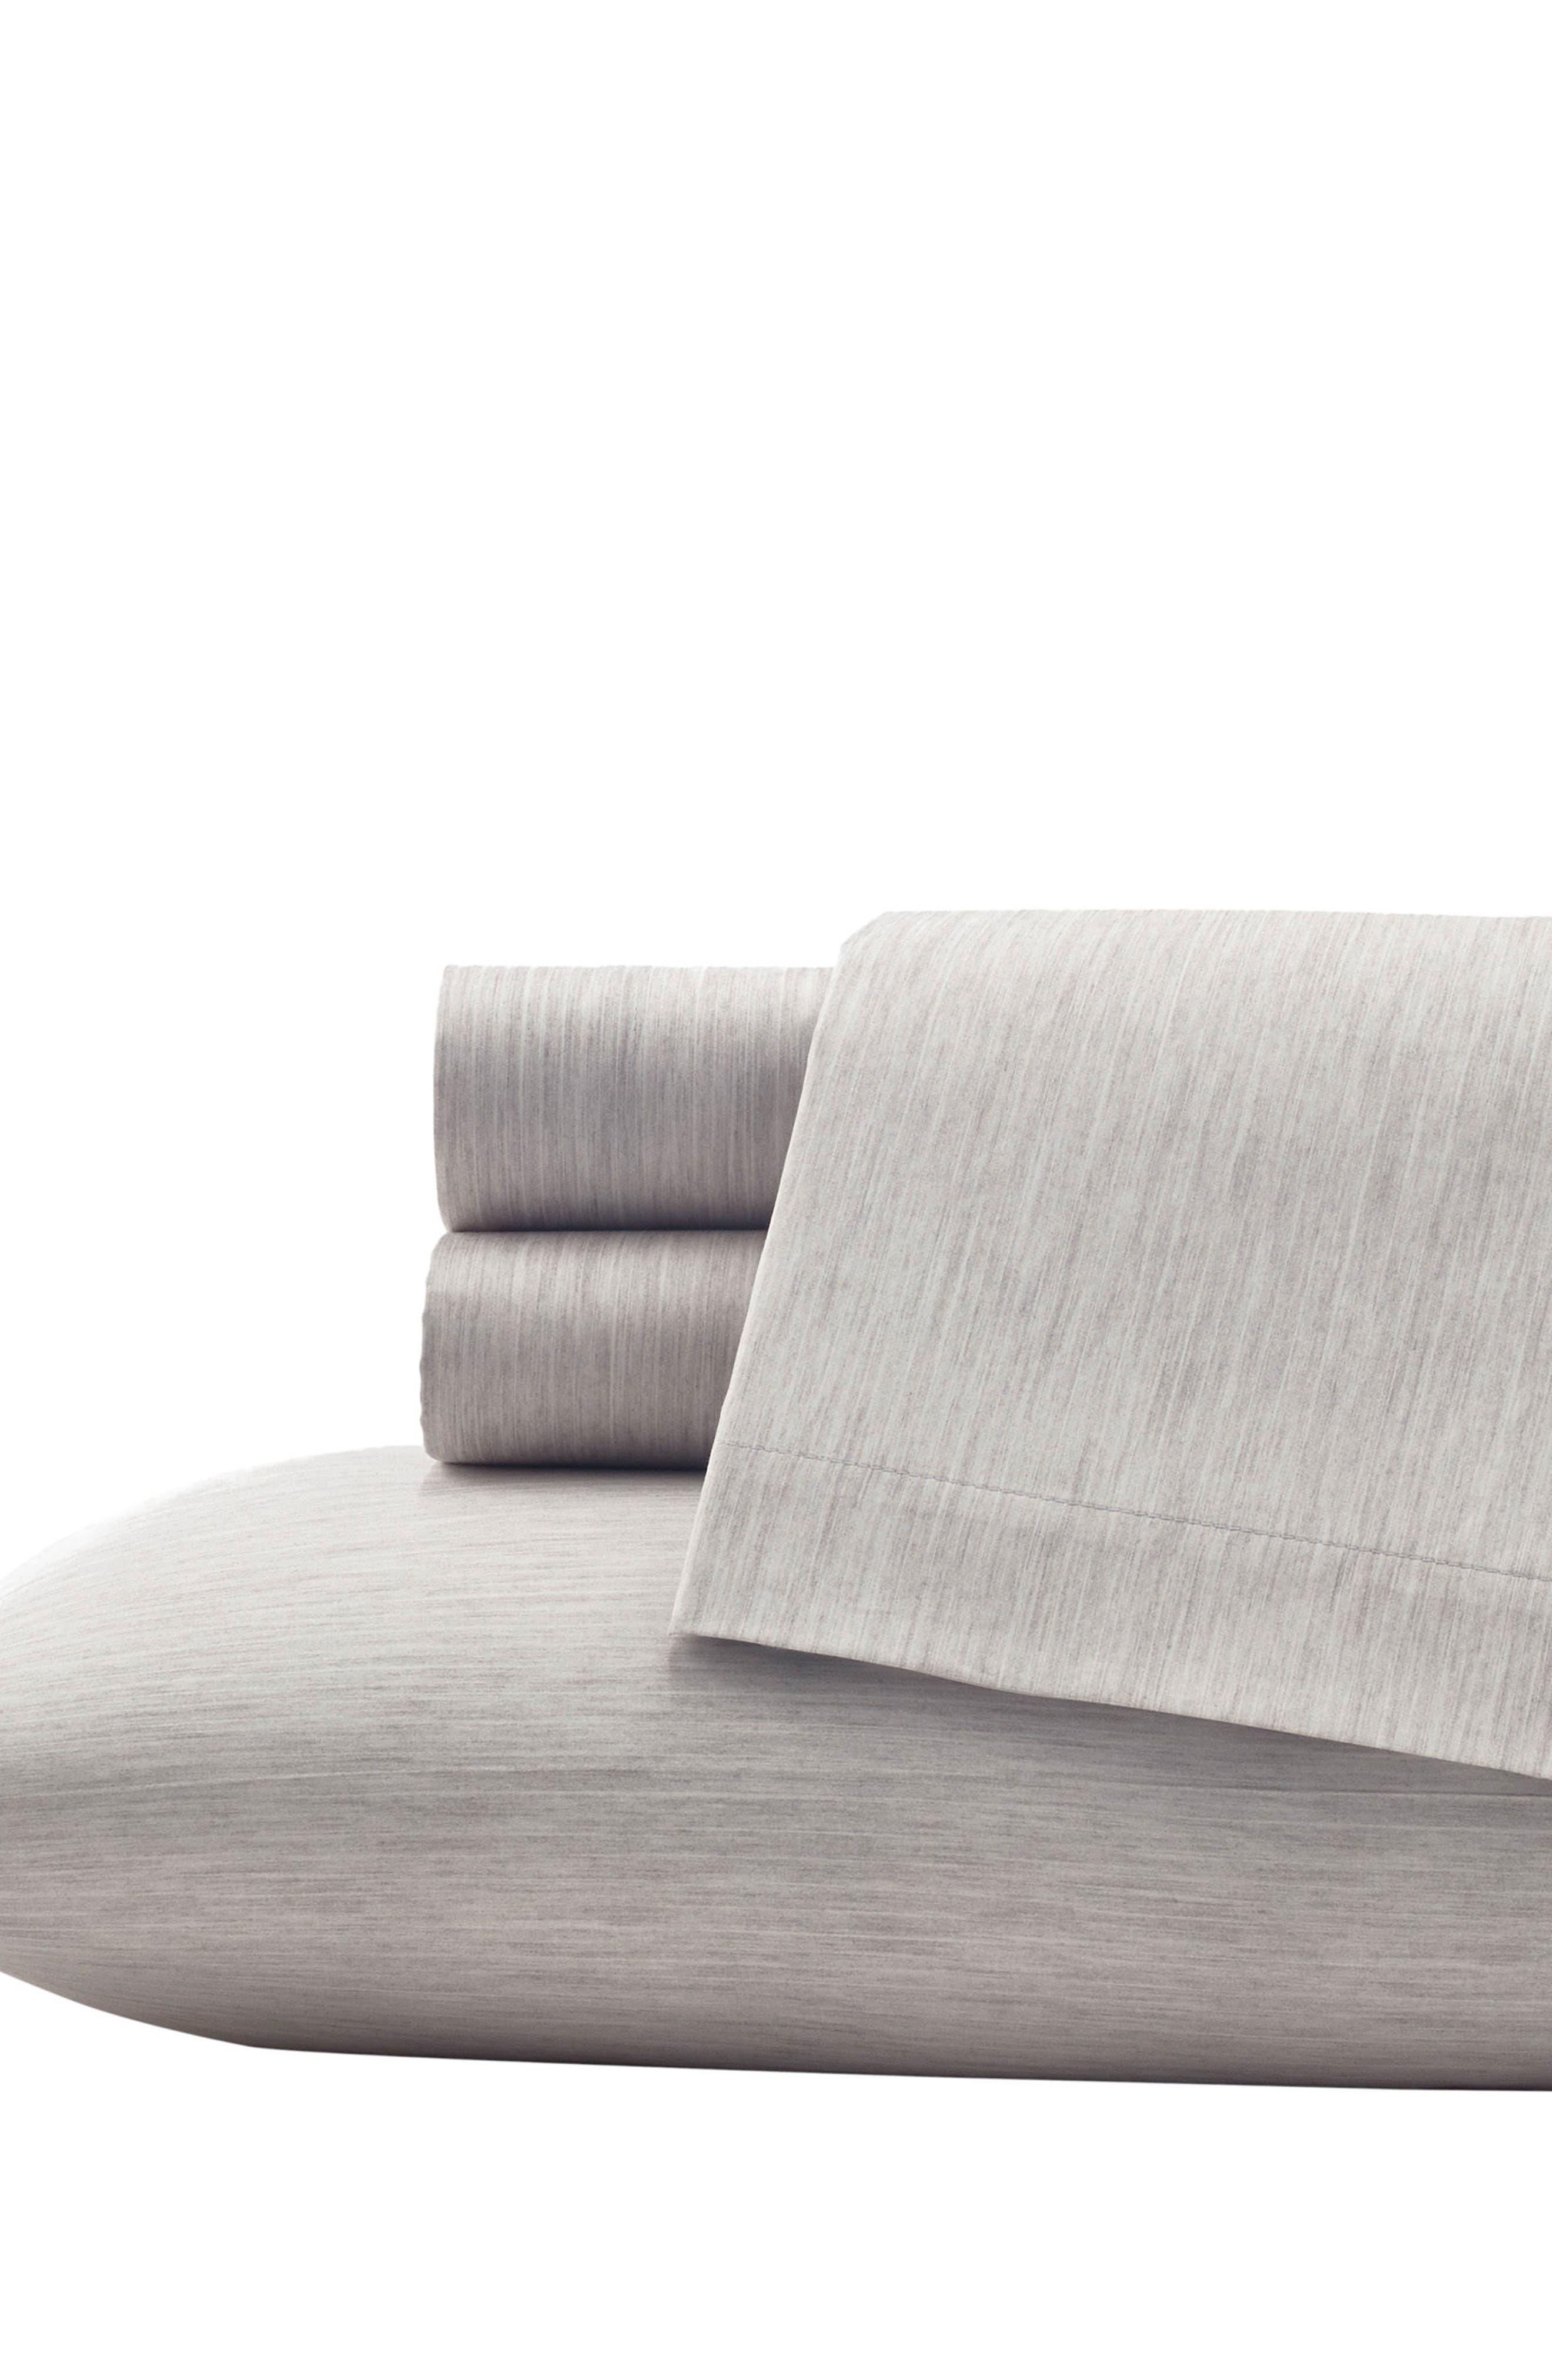 Vera Wang Marble Shibori 300 Thread Count Flat Sheet